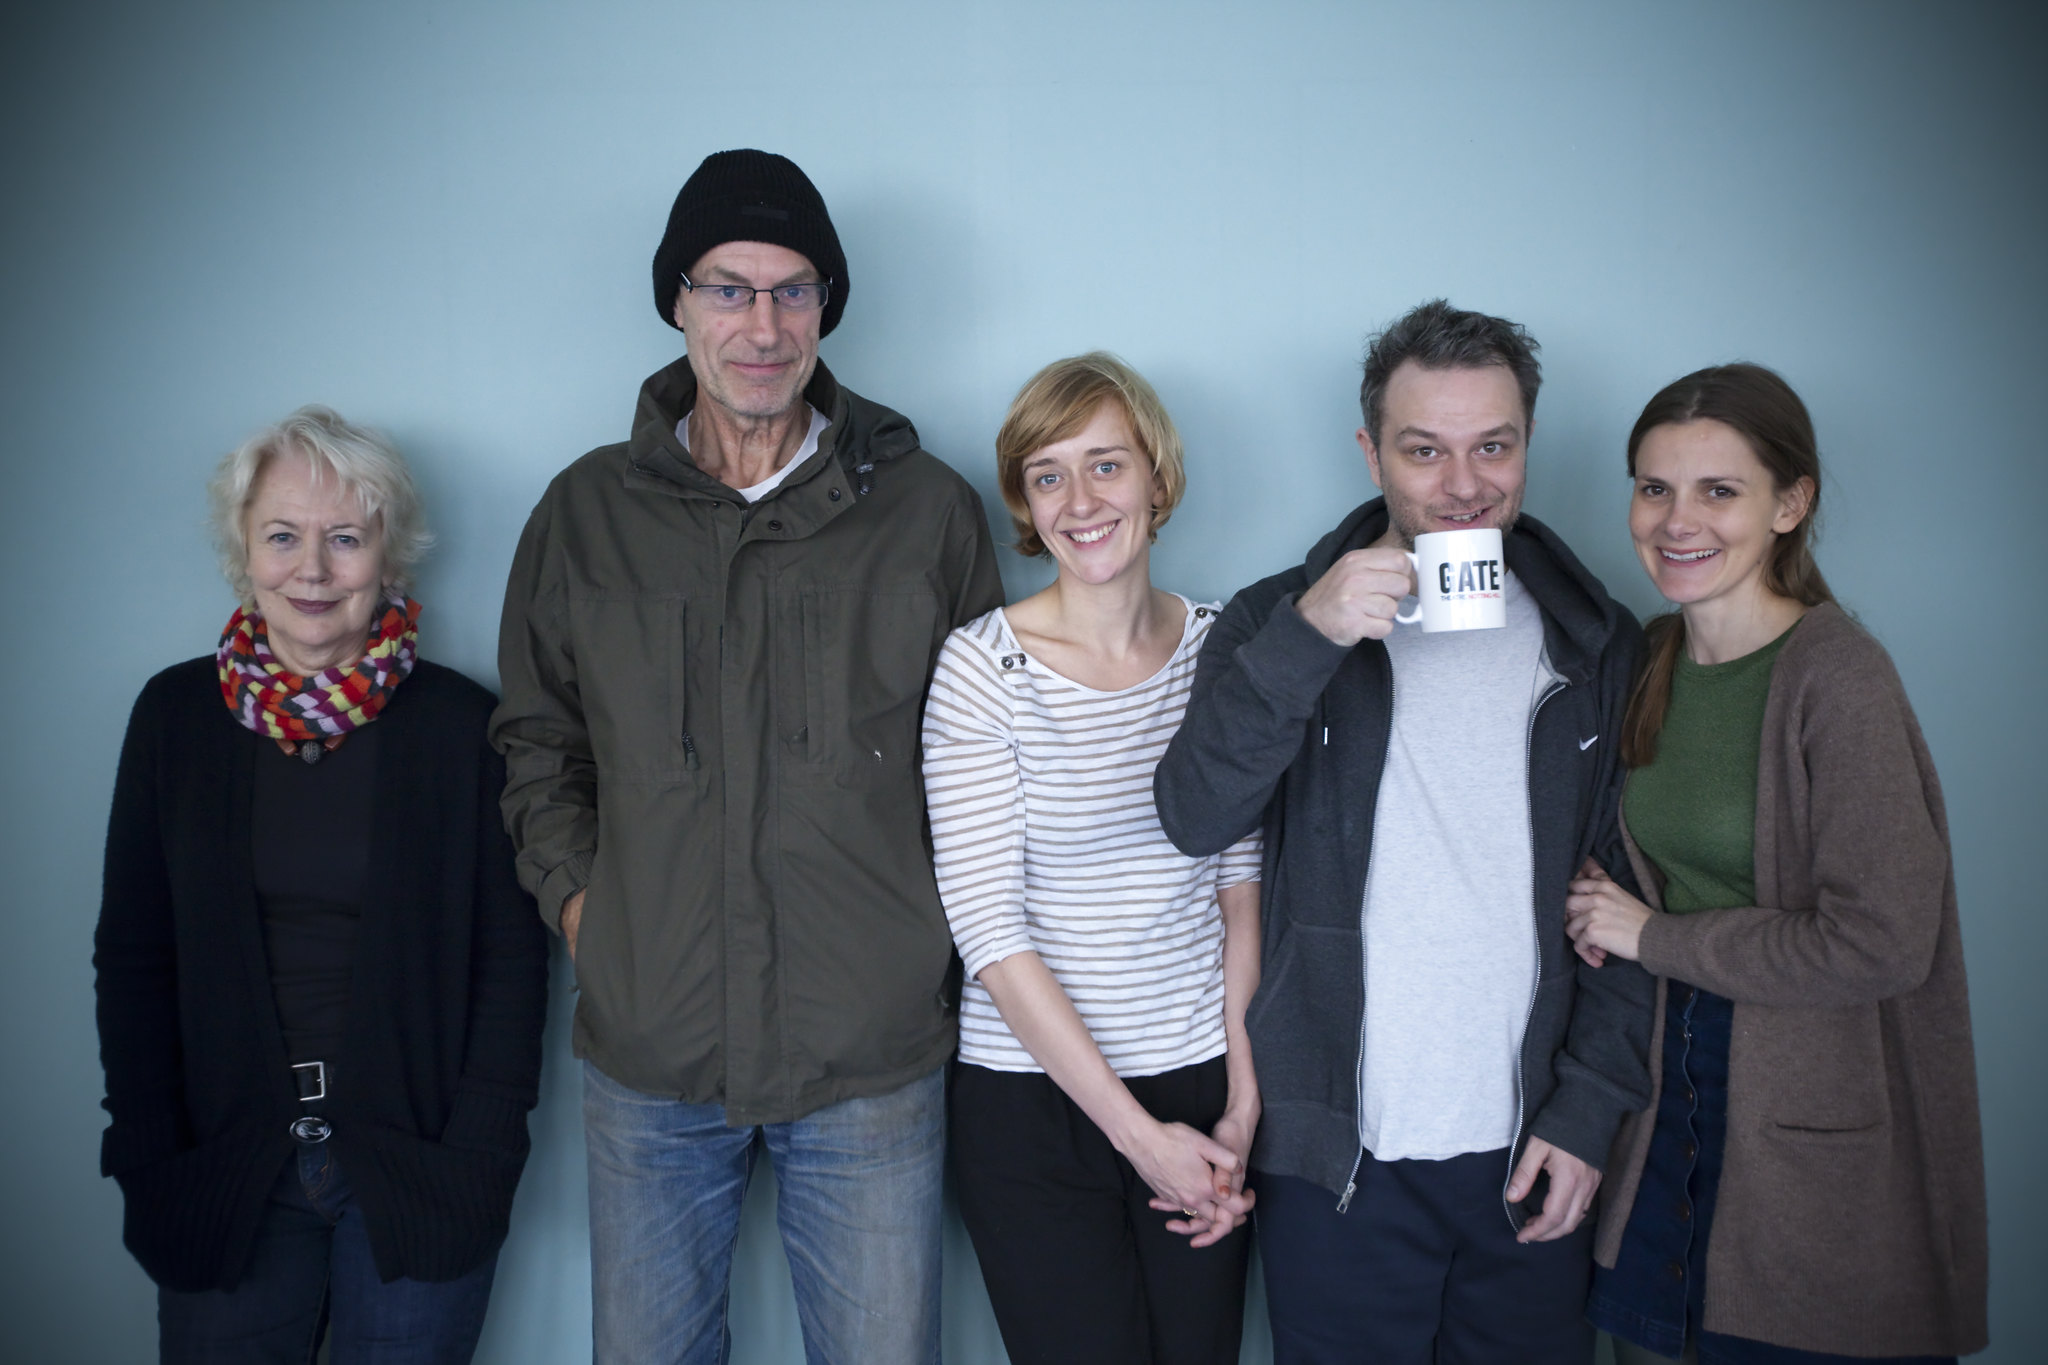 Dearbhla Molloy, Sam Cox, Lucy Ellinson, Jon Foster and Louise Brealey in rehearsals for THE TROJAN WOMEN (Photo © Iona Firouzabadi)